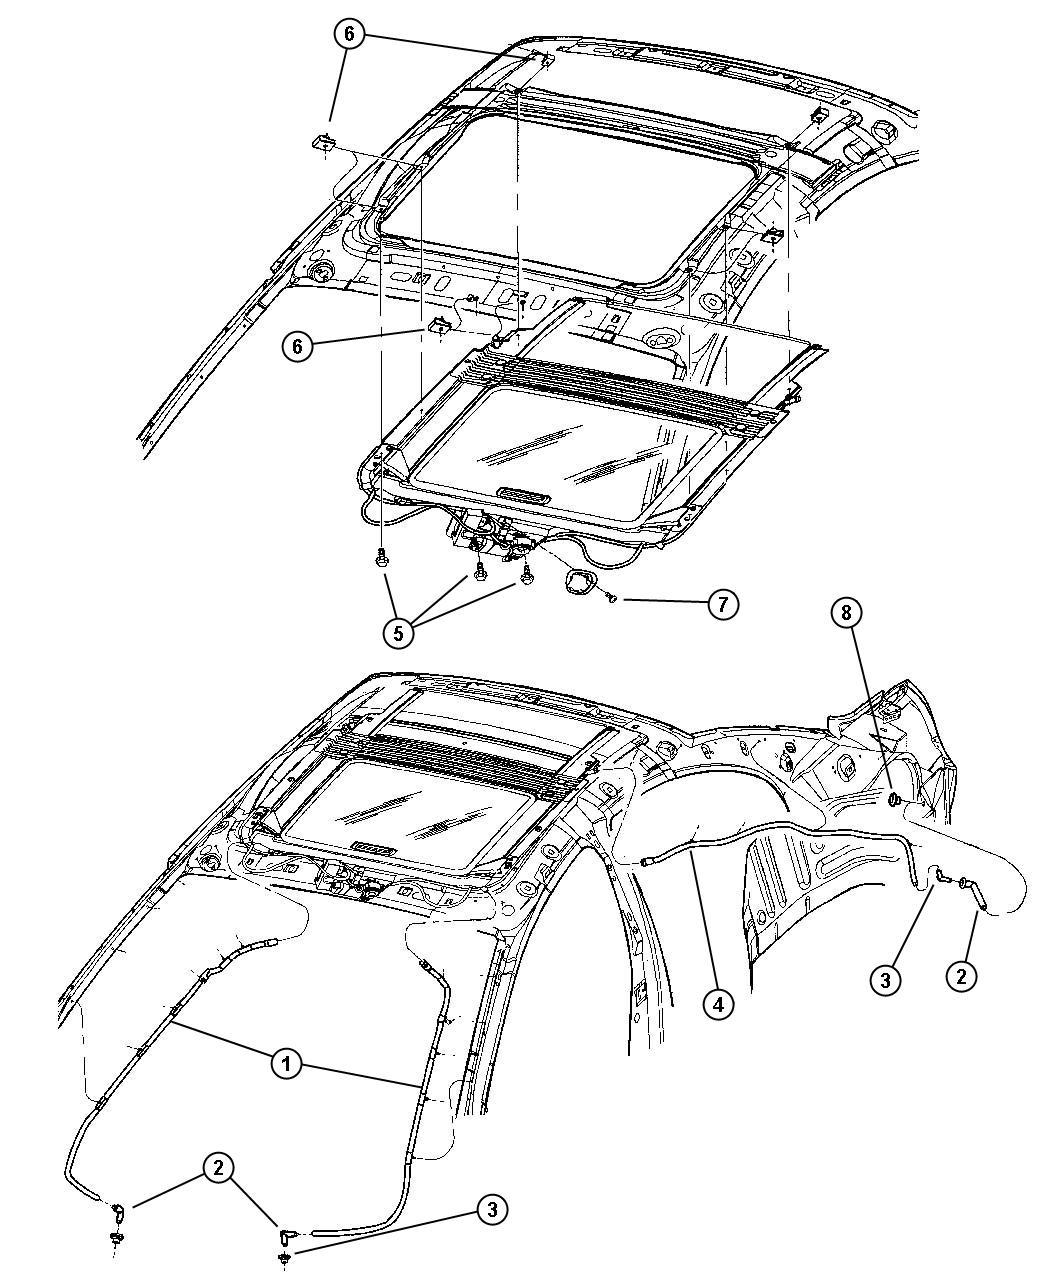 Dodge Stratus Rear Suspension